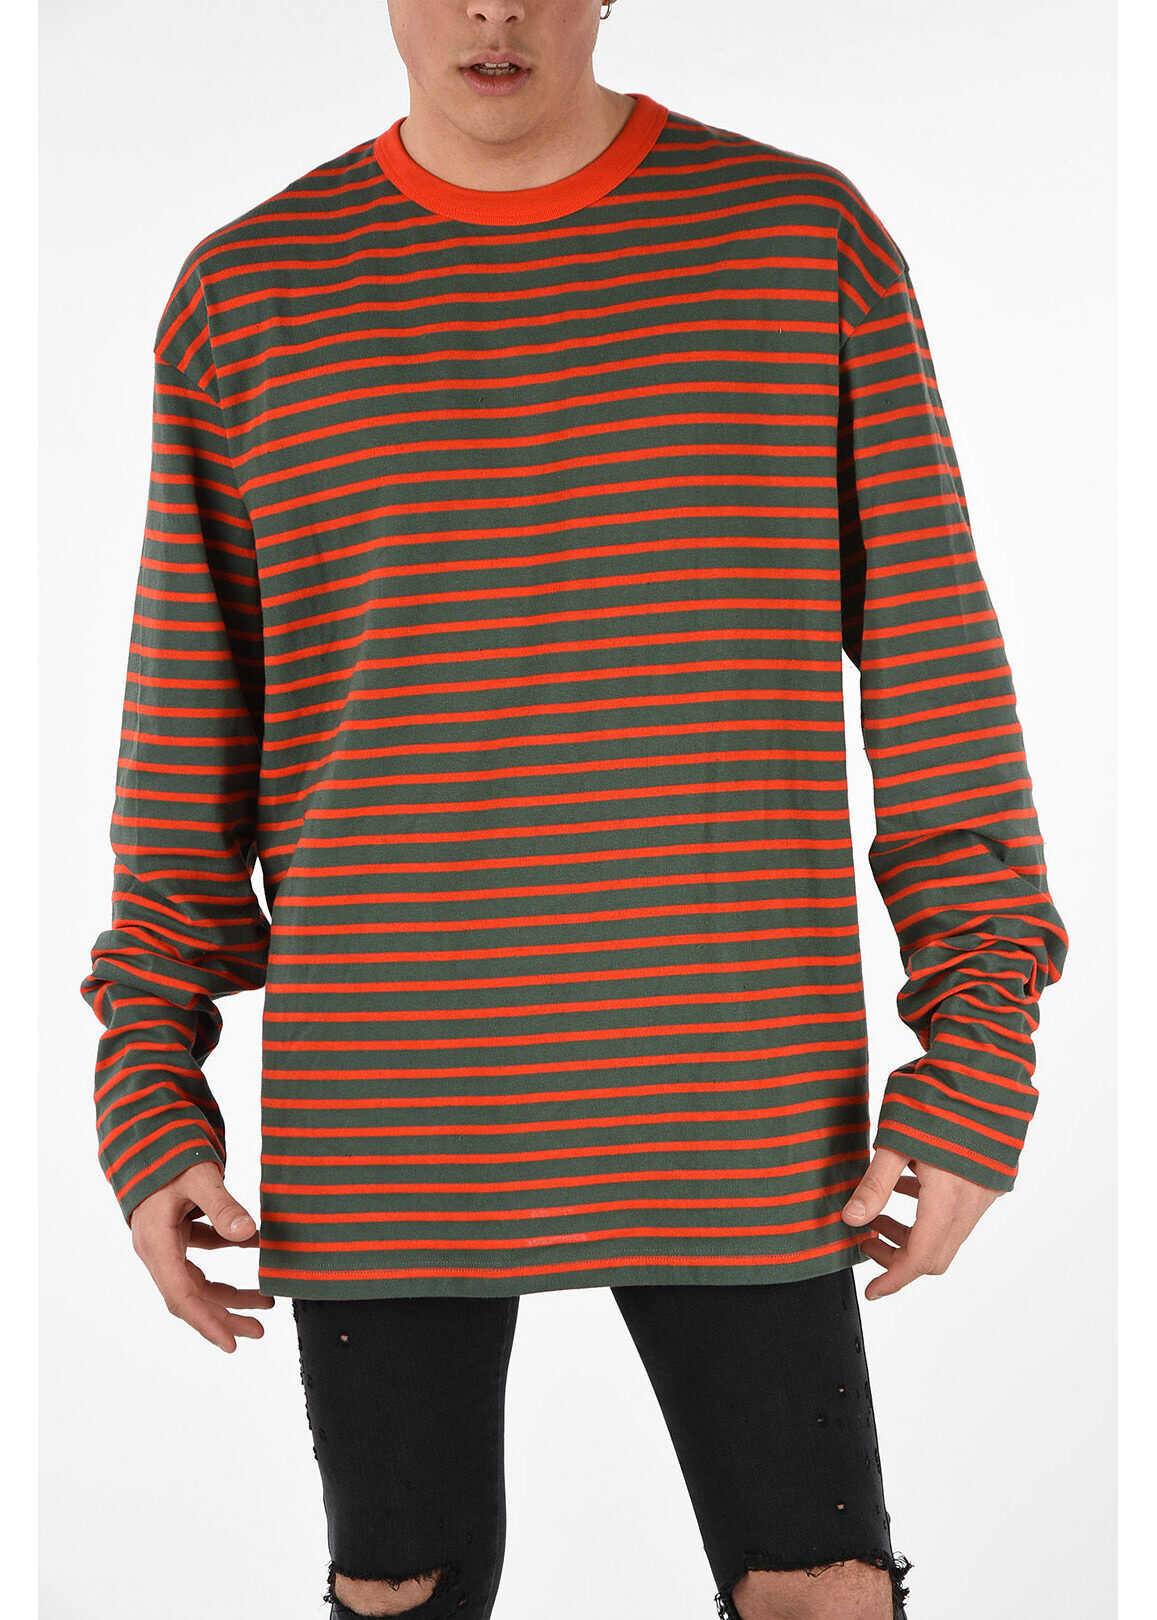 Diesel Striped T-DAICHI T-shirt MULTICOLOR imagine